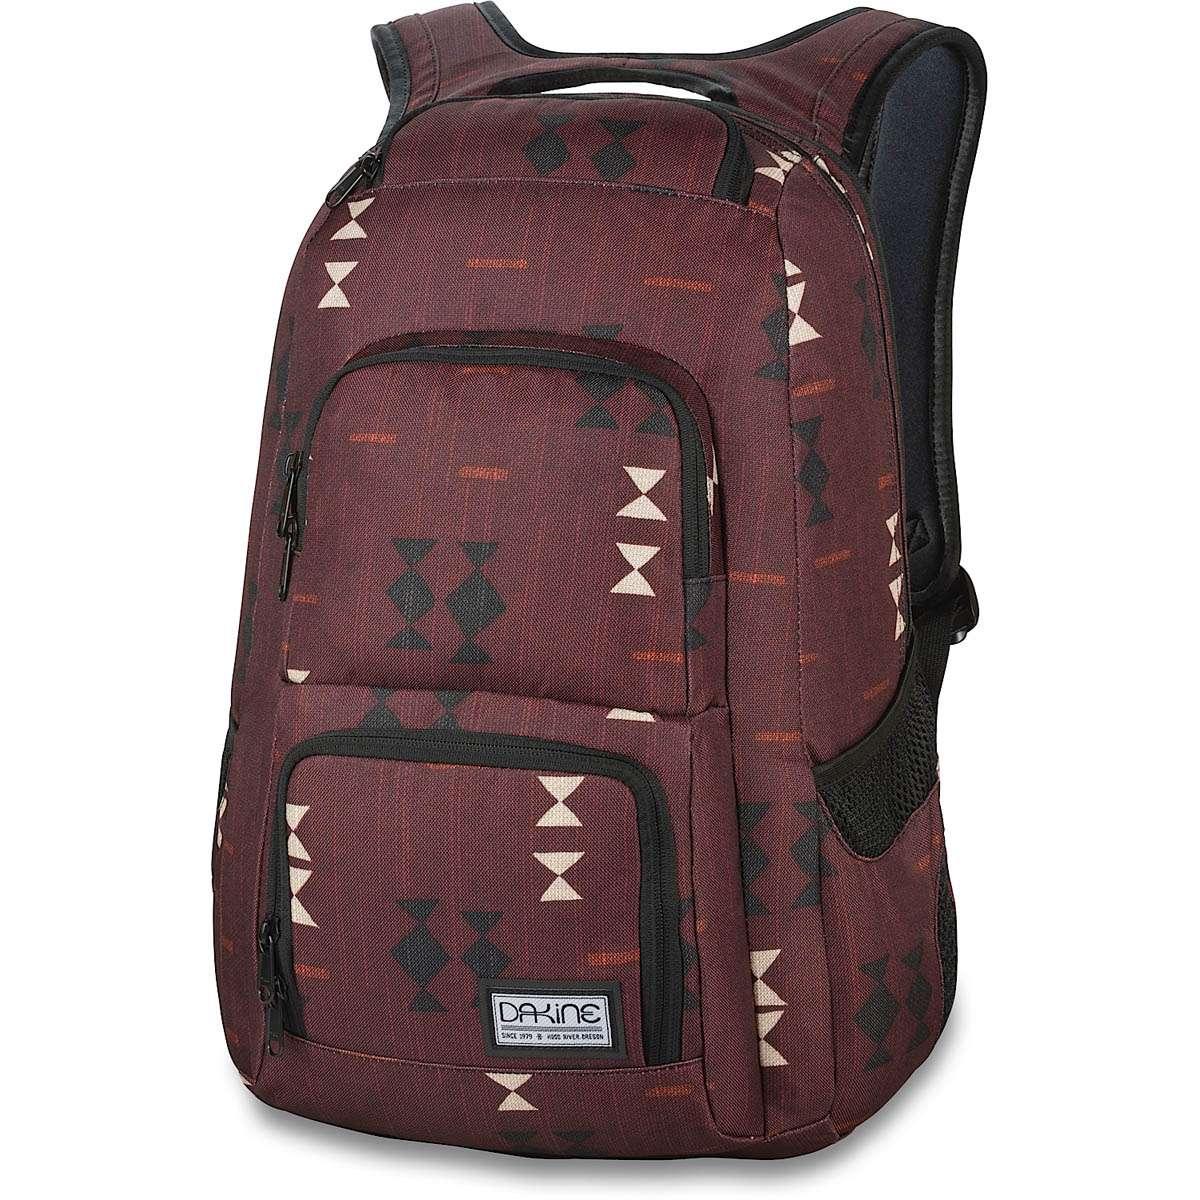 880ec6b557587 Dakine Jewel 26L Backpack Sundance